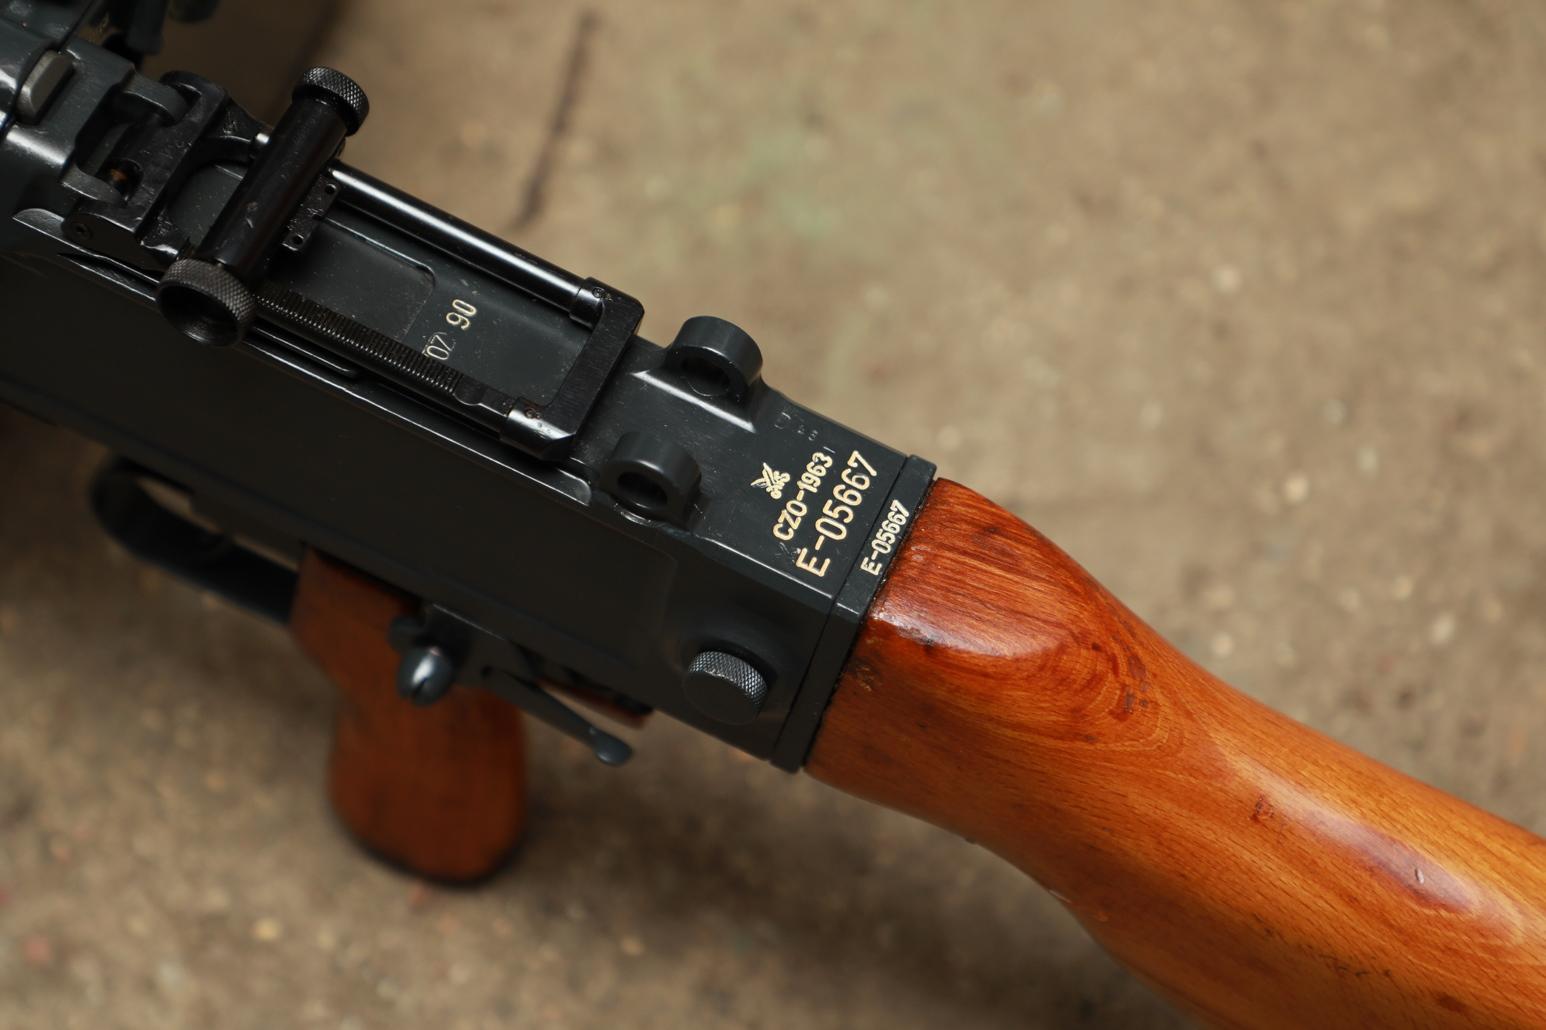 Чехословацкий пулемет UK-59 1963 года №Е-05667